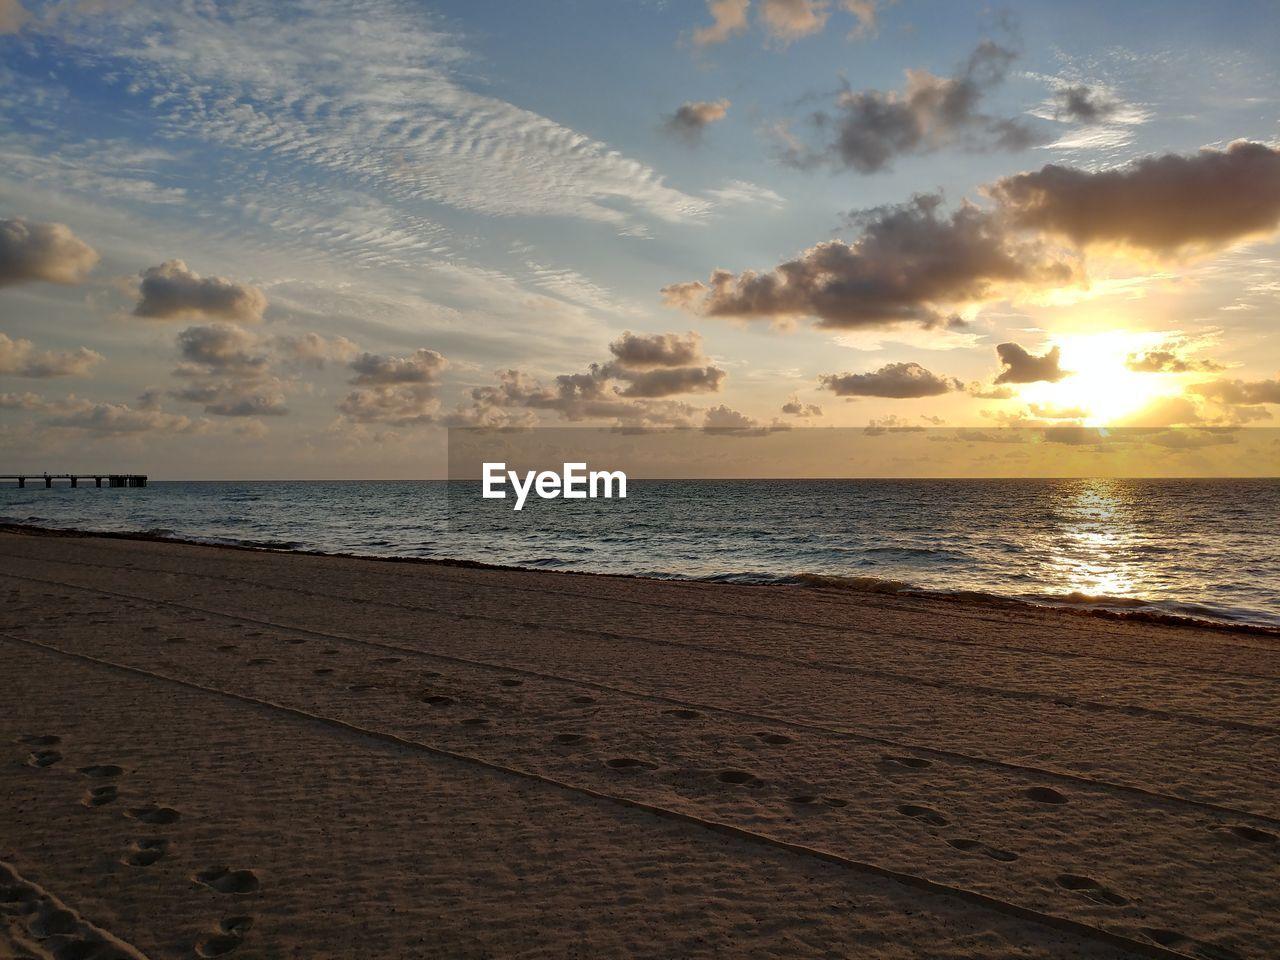 sky, sunset, sea, water, land, beach, scenics - nature, cloud - sky, beauty in nature, horizon over water, horizon, tranquil scene, tranquility, nature, idyllic, sand, non-urban scene, outdoors, no people